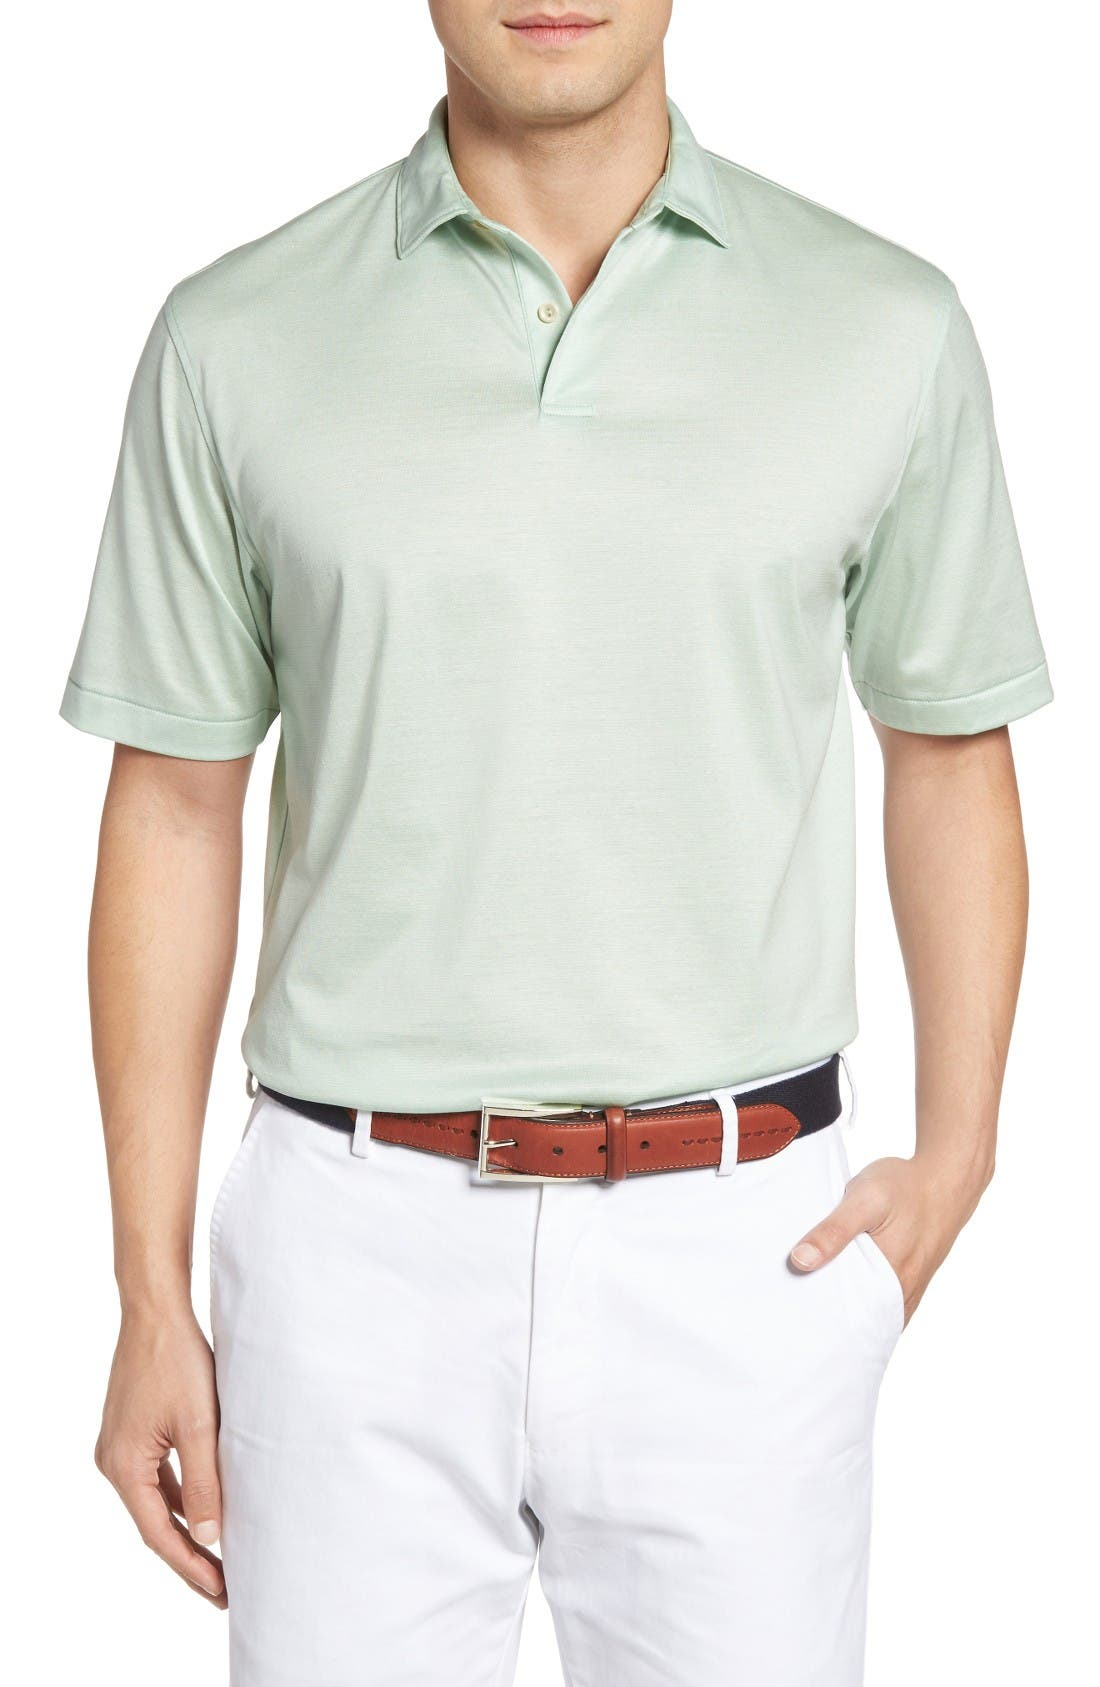 Peter Millar Nanoluxe Golf Polo